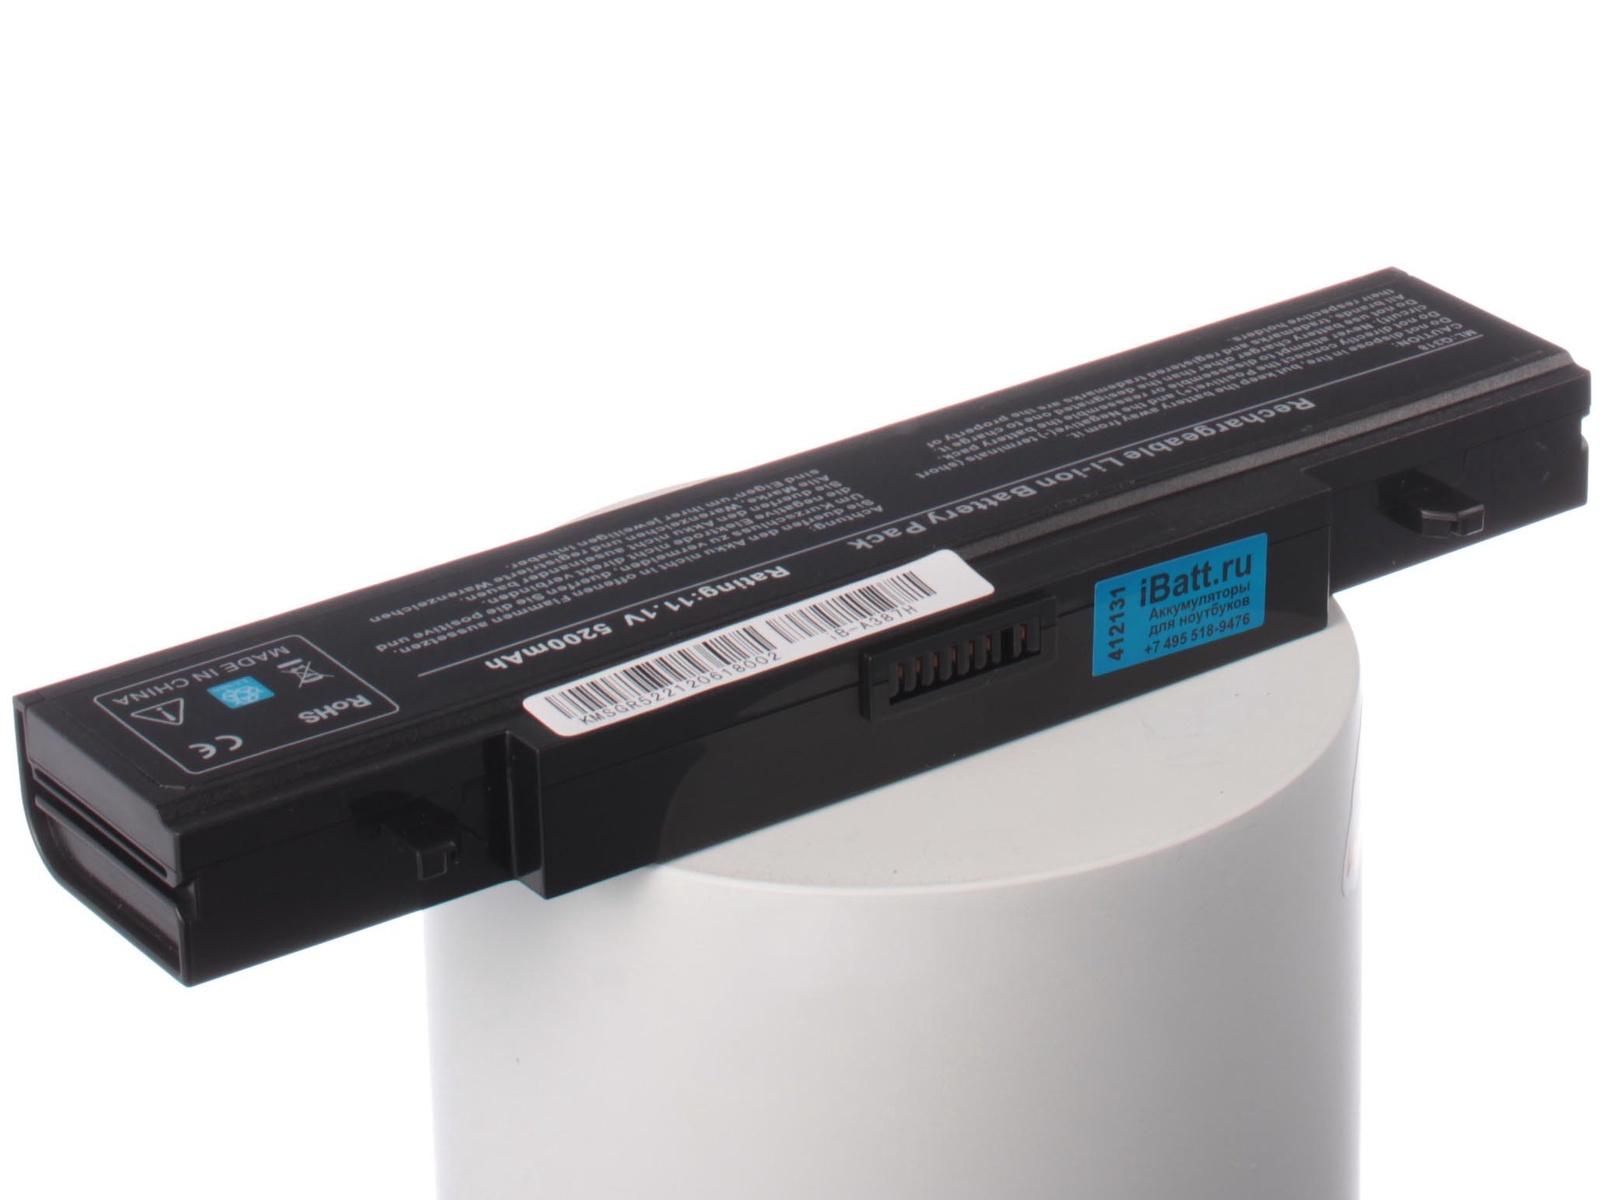 Аккумулятор для ноутбука iBatt для Samsung 300V5A-S08, 305V5Z, 355V5C-S0A, NP270E5E-X02, R590-JS01, RF710-S04, 300E7A-S08, 300E7A-S0B, 350E7X, 355E5C-S05, R425-JU04, R440-JT03, R730-JA06, R780-JS09, RV410-S01, RV511-S02 аккумулятор для ноутбука anybatt для samsung rv711 a01 300e5x u02 300v5a s0e 305v5a t09 310e5c u05 350e7c a04 r430 ja01 r780 js02 rf712 s01 300e5c a0e 300e5z s01 np270e5e k02 r469 js01 r525 jt05 r540 js01 r580 js04